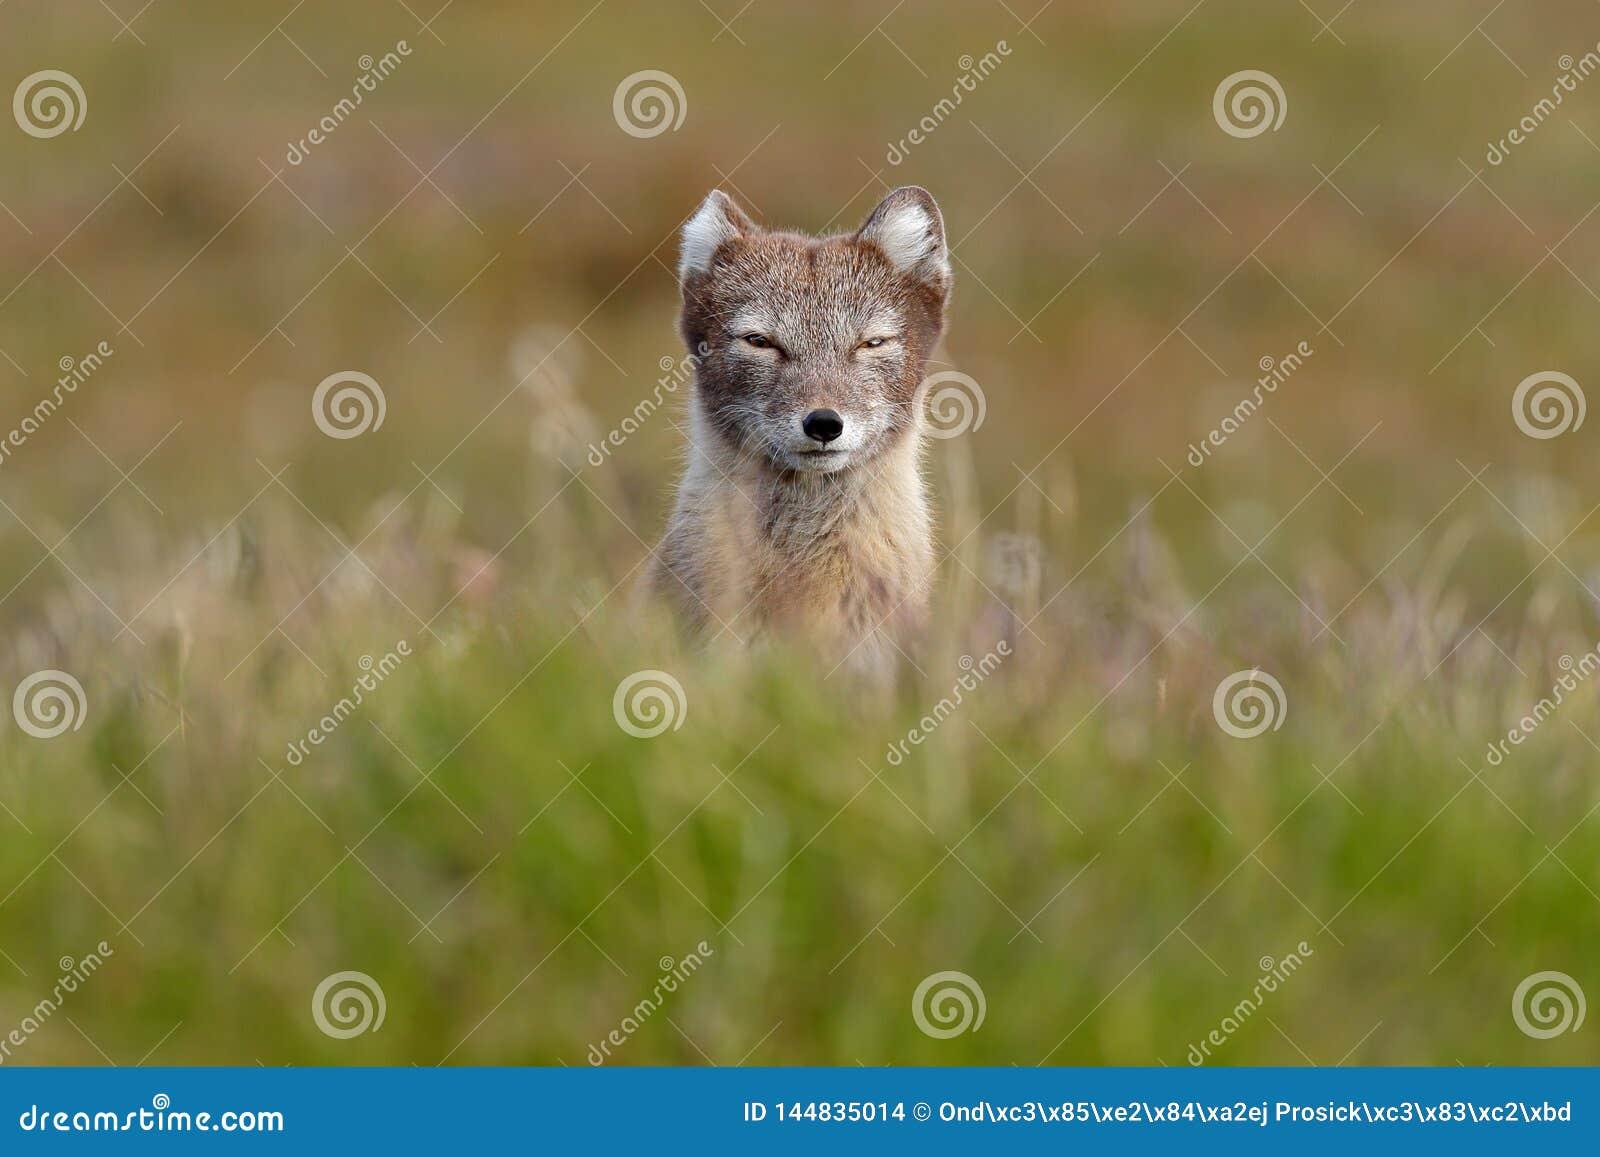 Arctic Fox, Vulpes lagopus, cute animal portrait in the nature habitat, grassy meadow with flowers, Svalbard, Norway. Beautiful